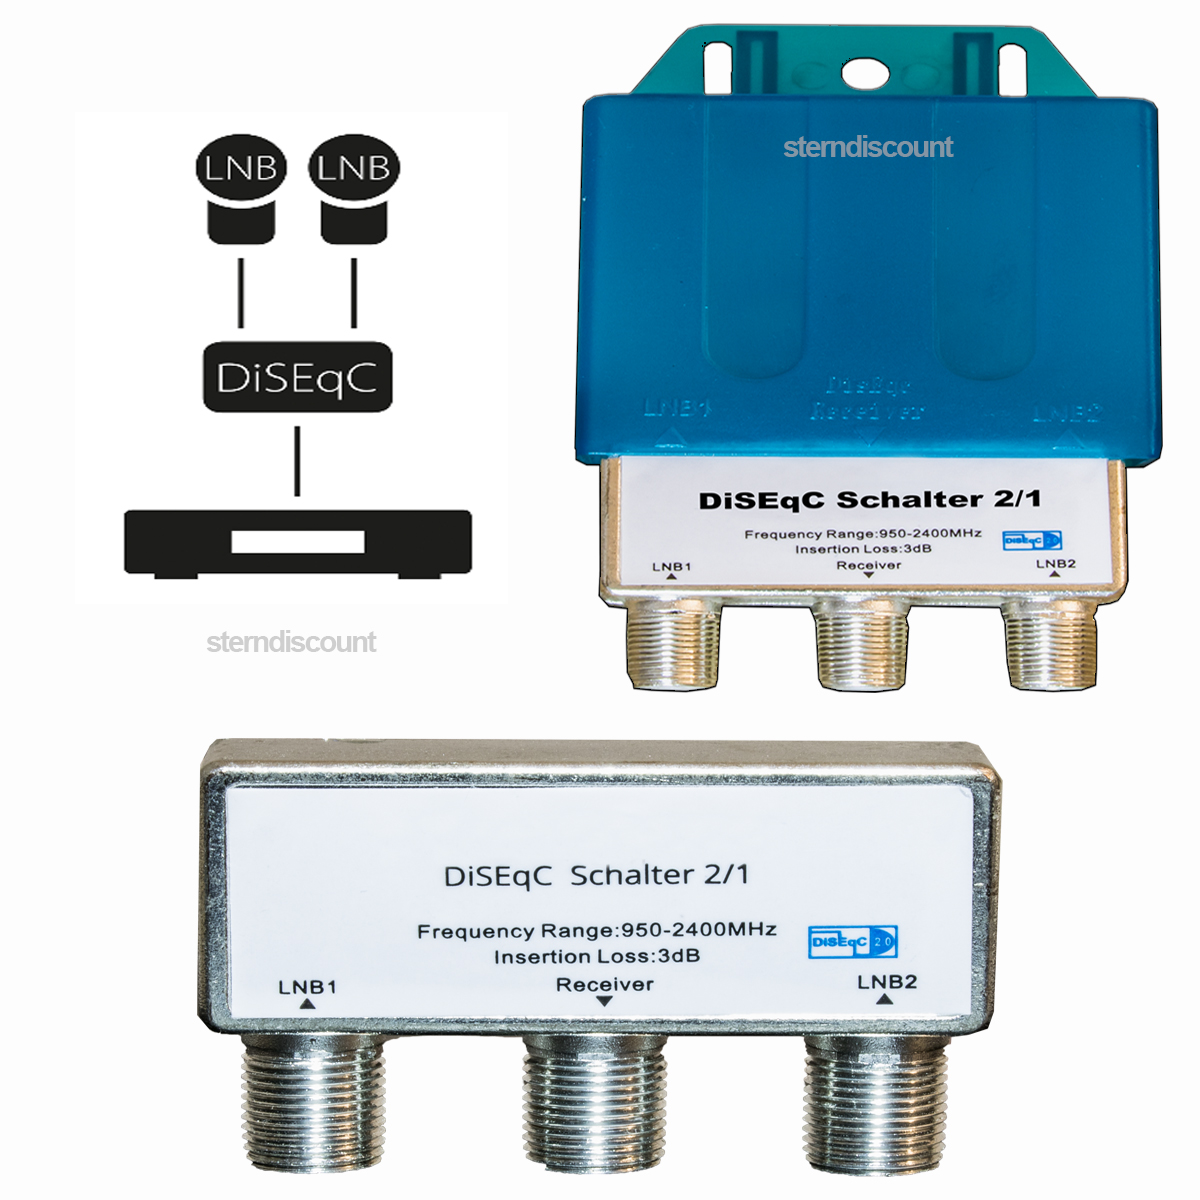 diseqc schalter 2 1 sat lnb umschalter switch 4k hdtv ready. Black Bedroom Furniture Sets. Home Design Ideas